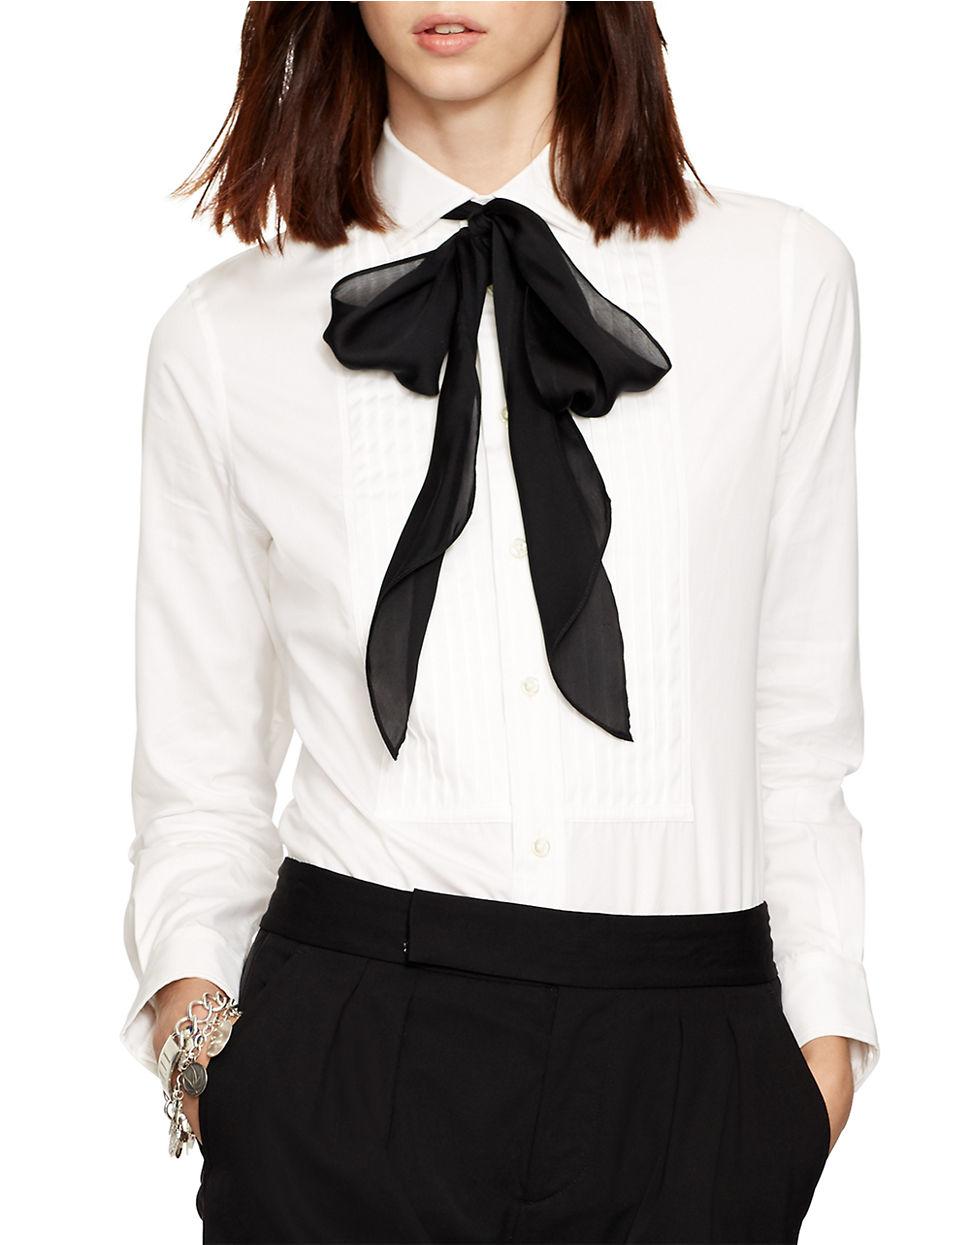 3ddb869ec12a4c Polo Ralph Lauren Cotton Poplin Tuxedo Shirt in White - Lyst